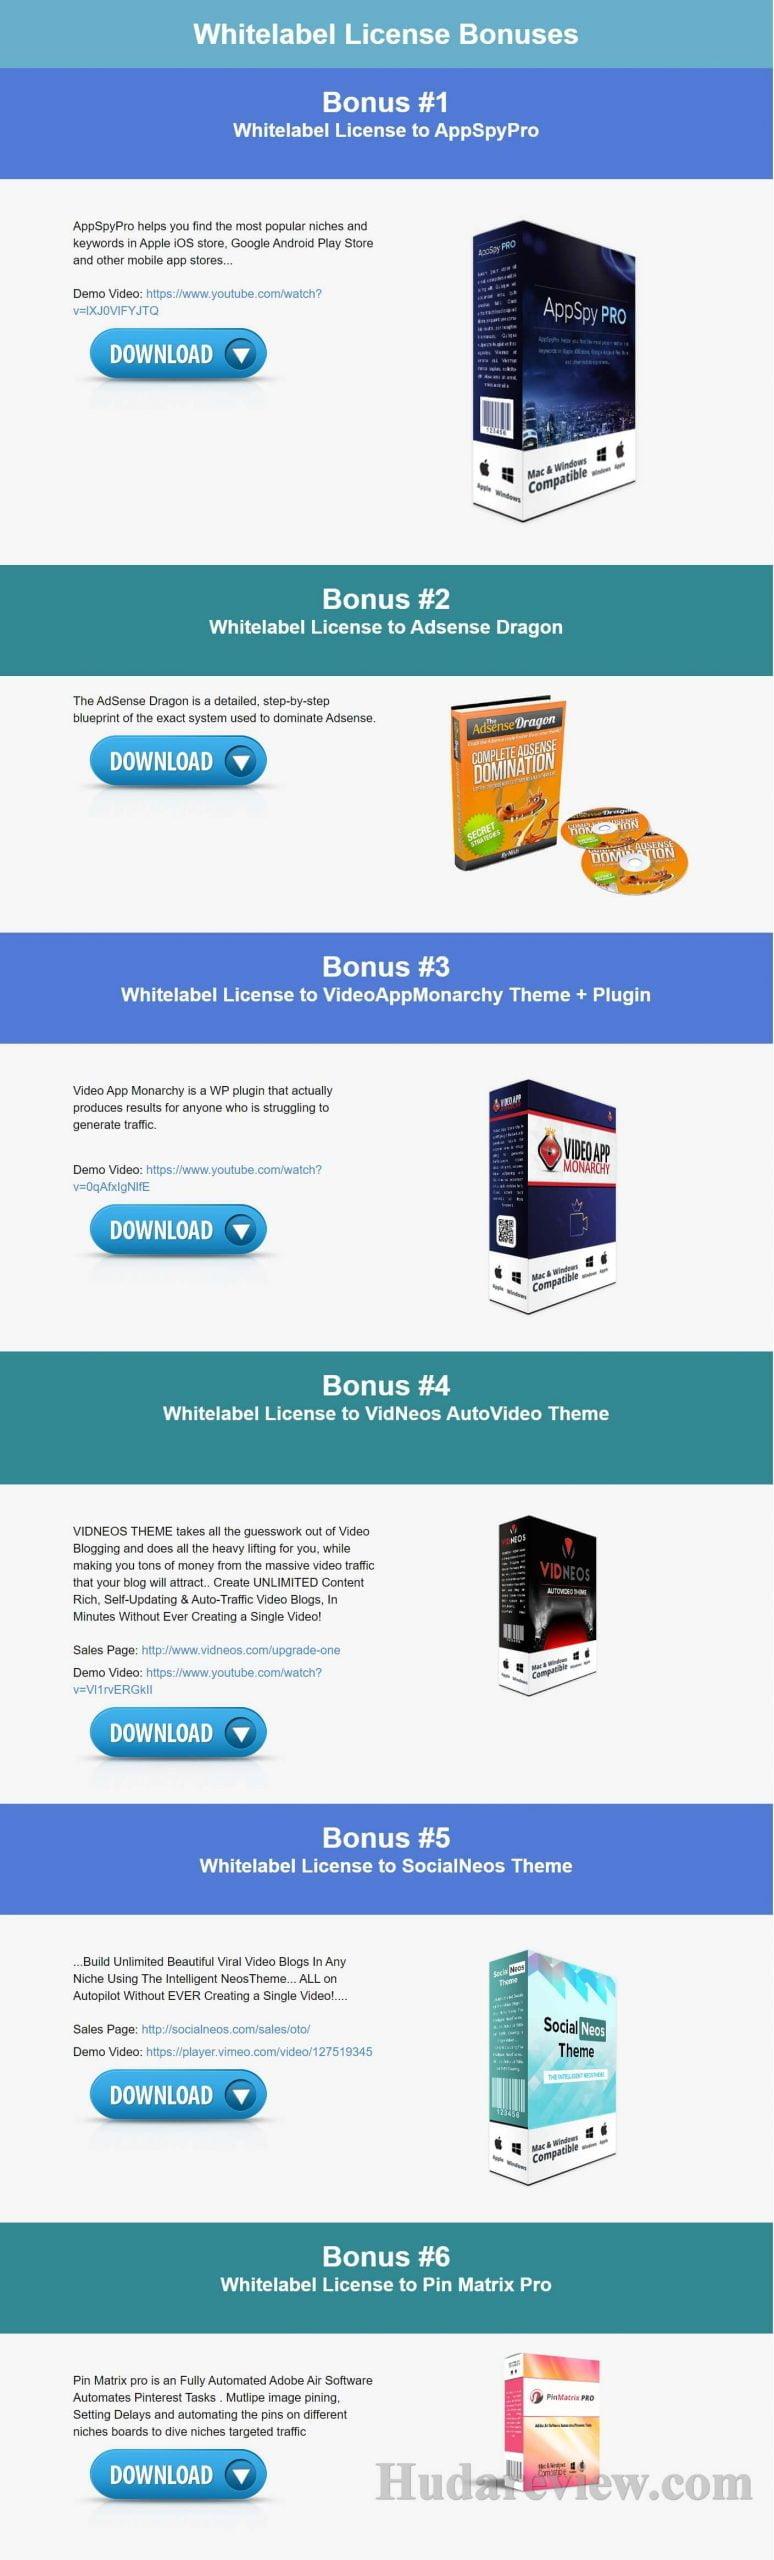 AgencyReel-Review-Bonus-4